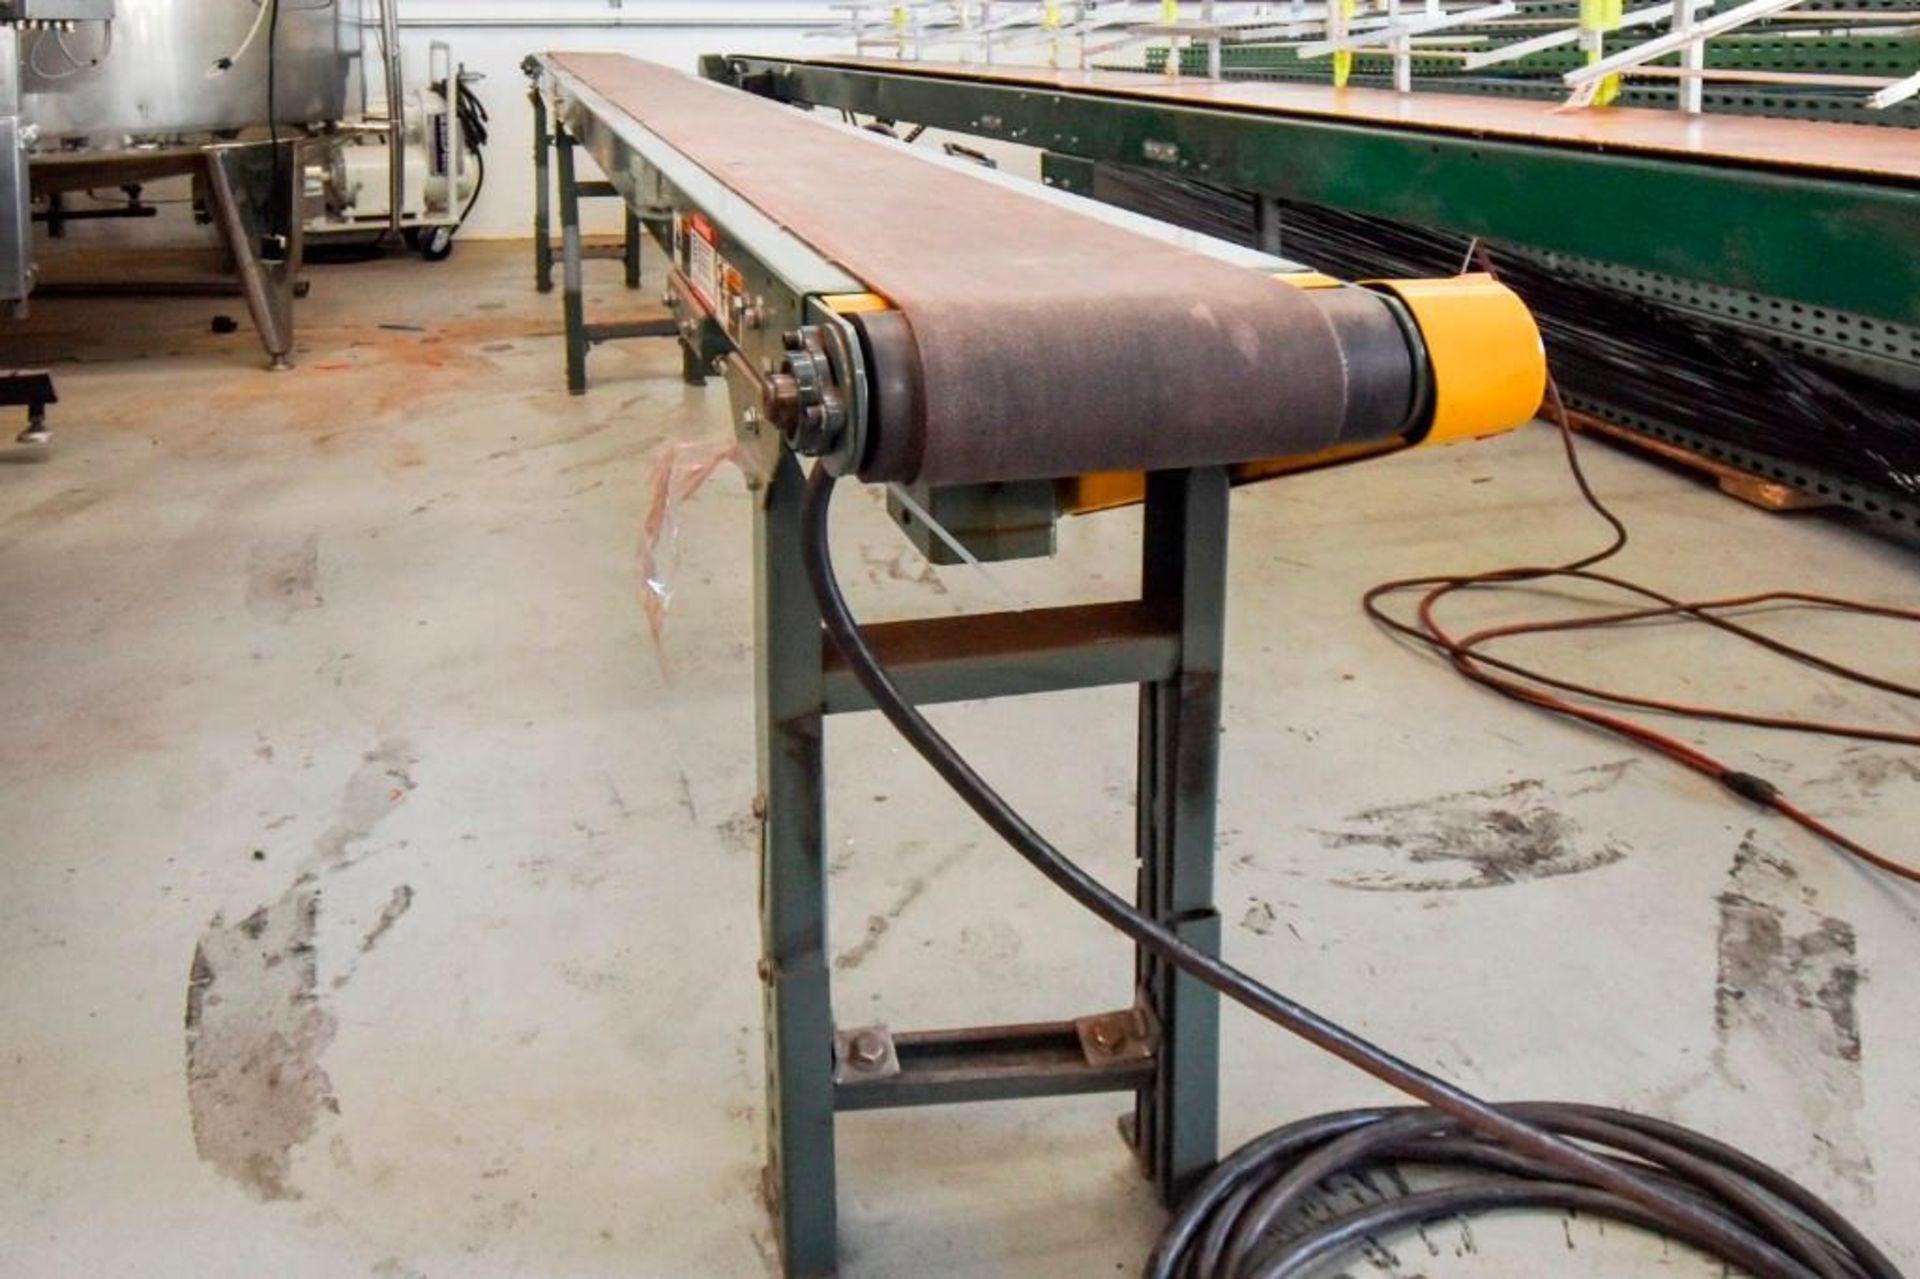 Hytrol Conveyor - Image 9 of 10